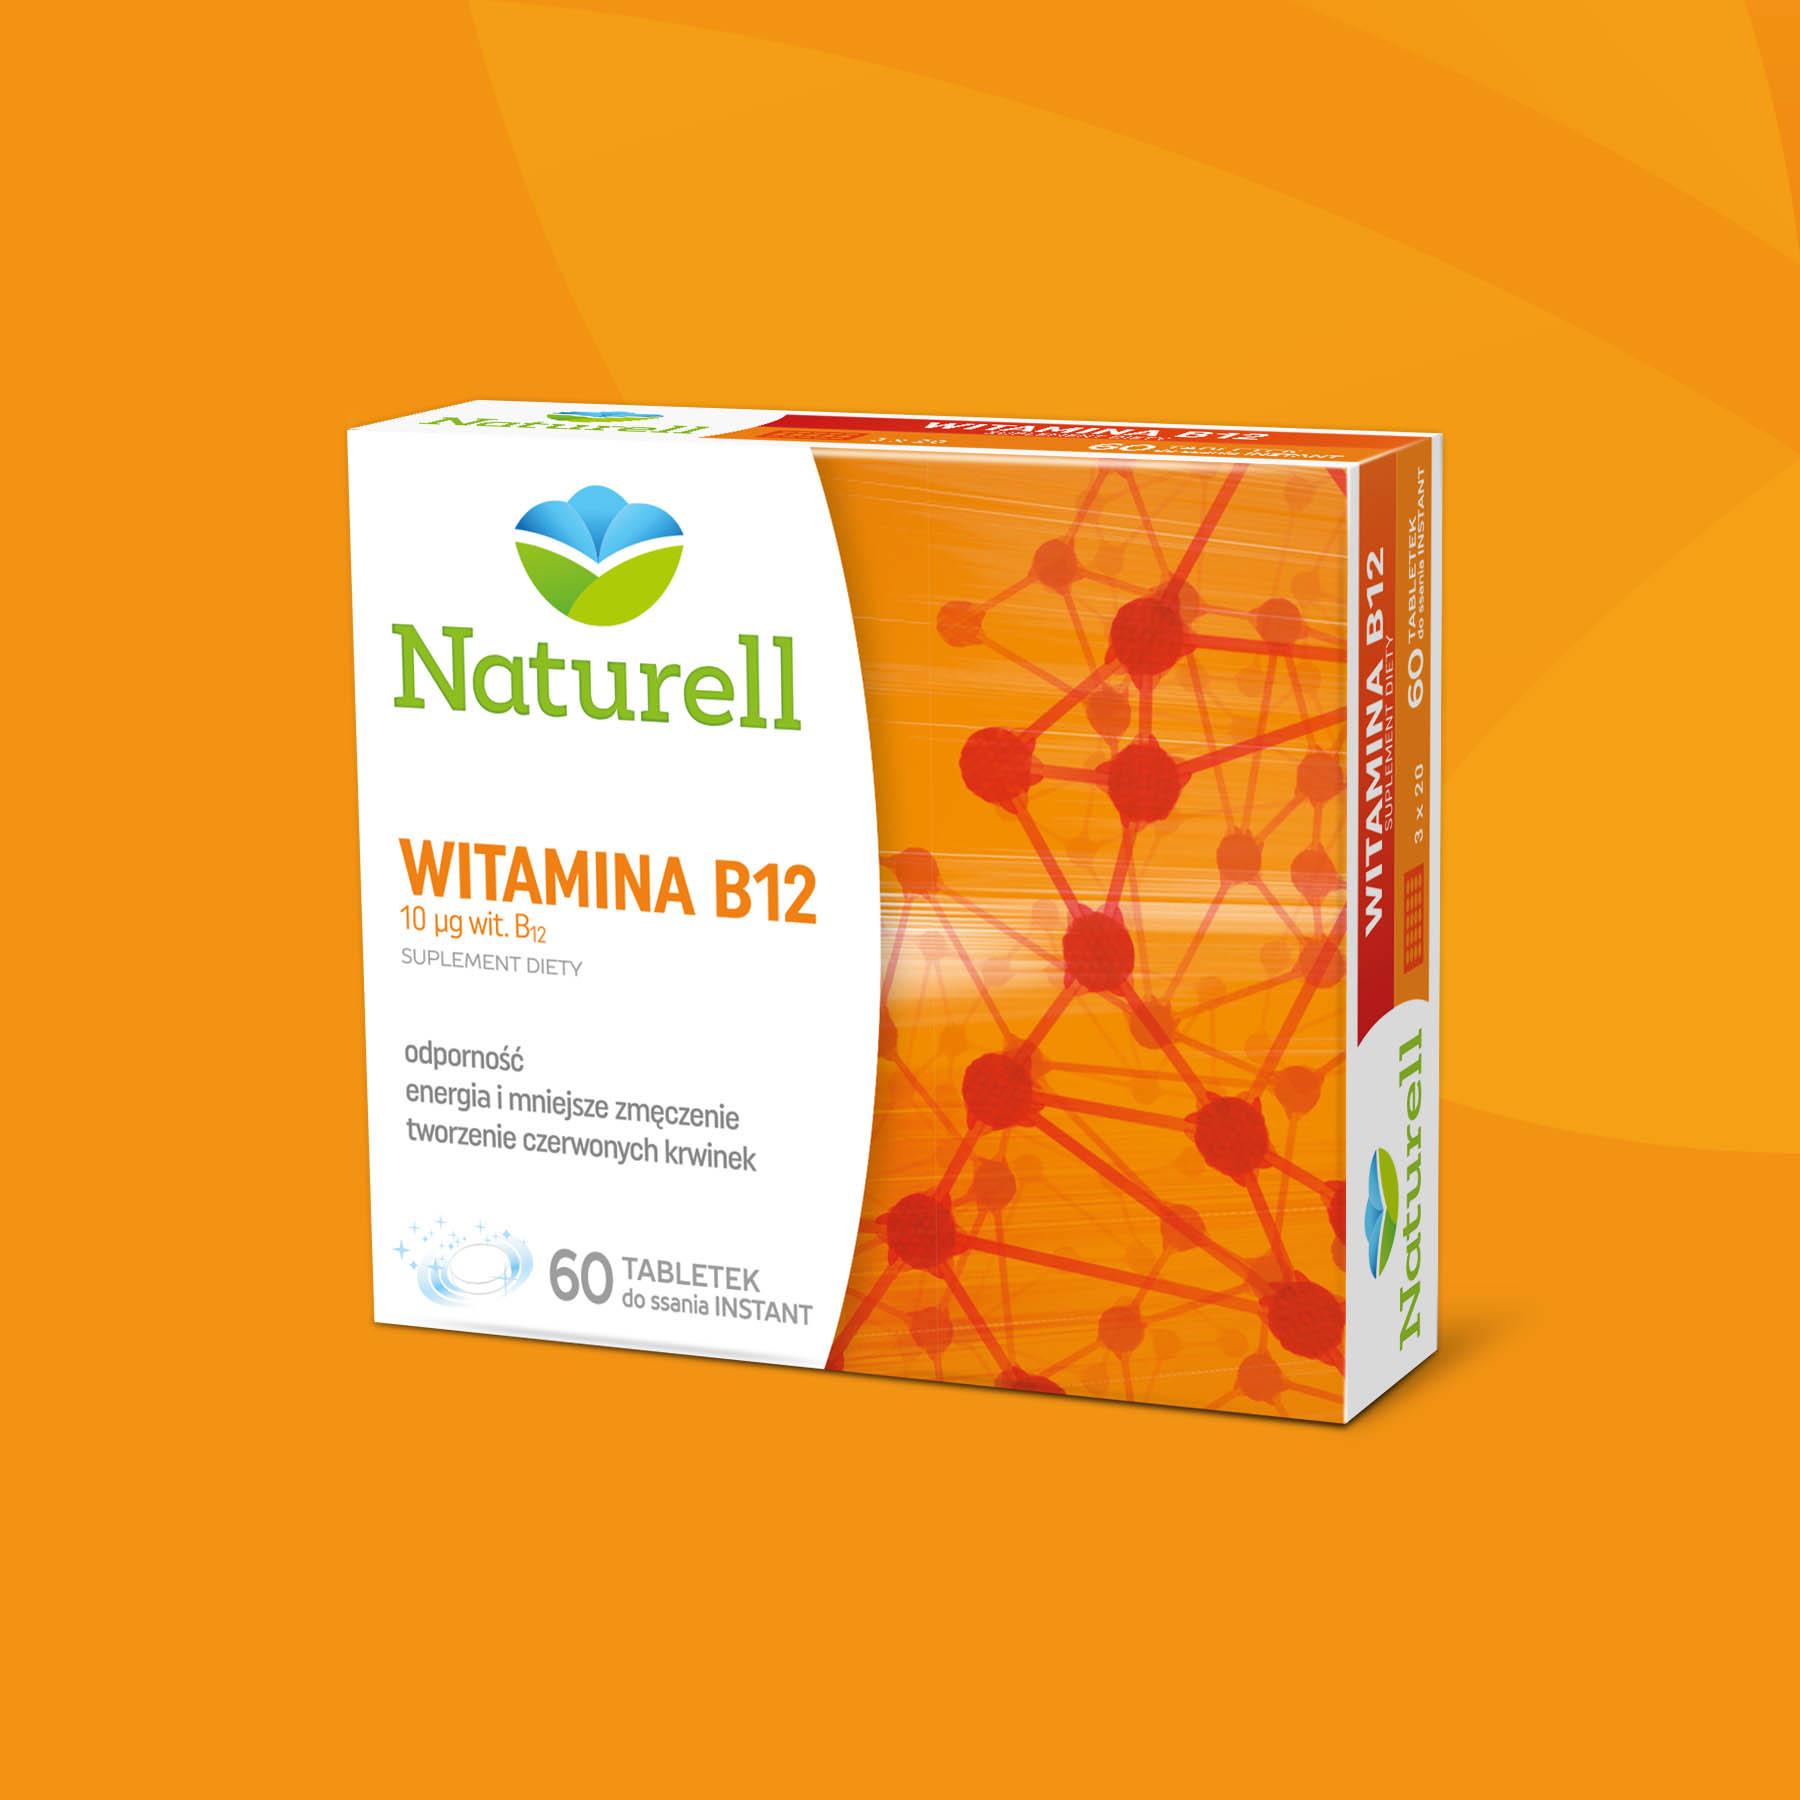 Naturell Vitamin B12 Package Design